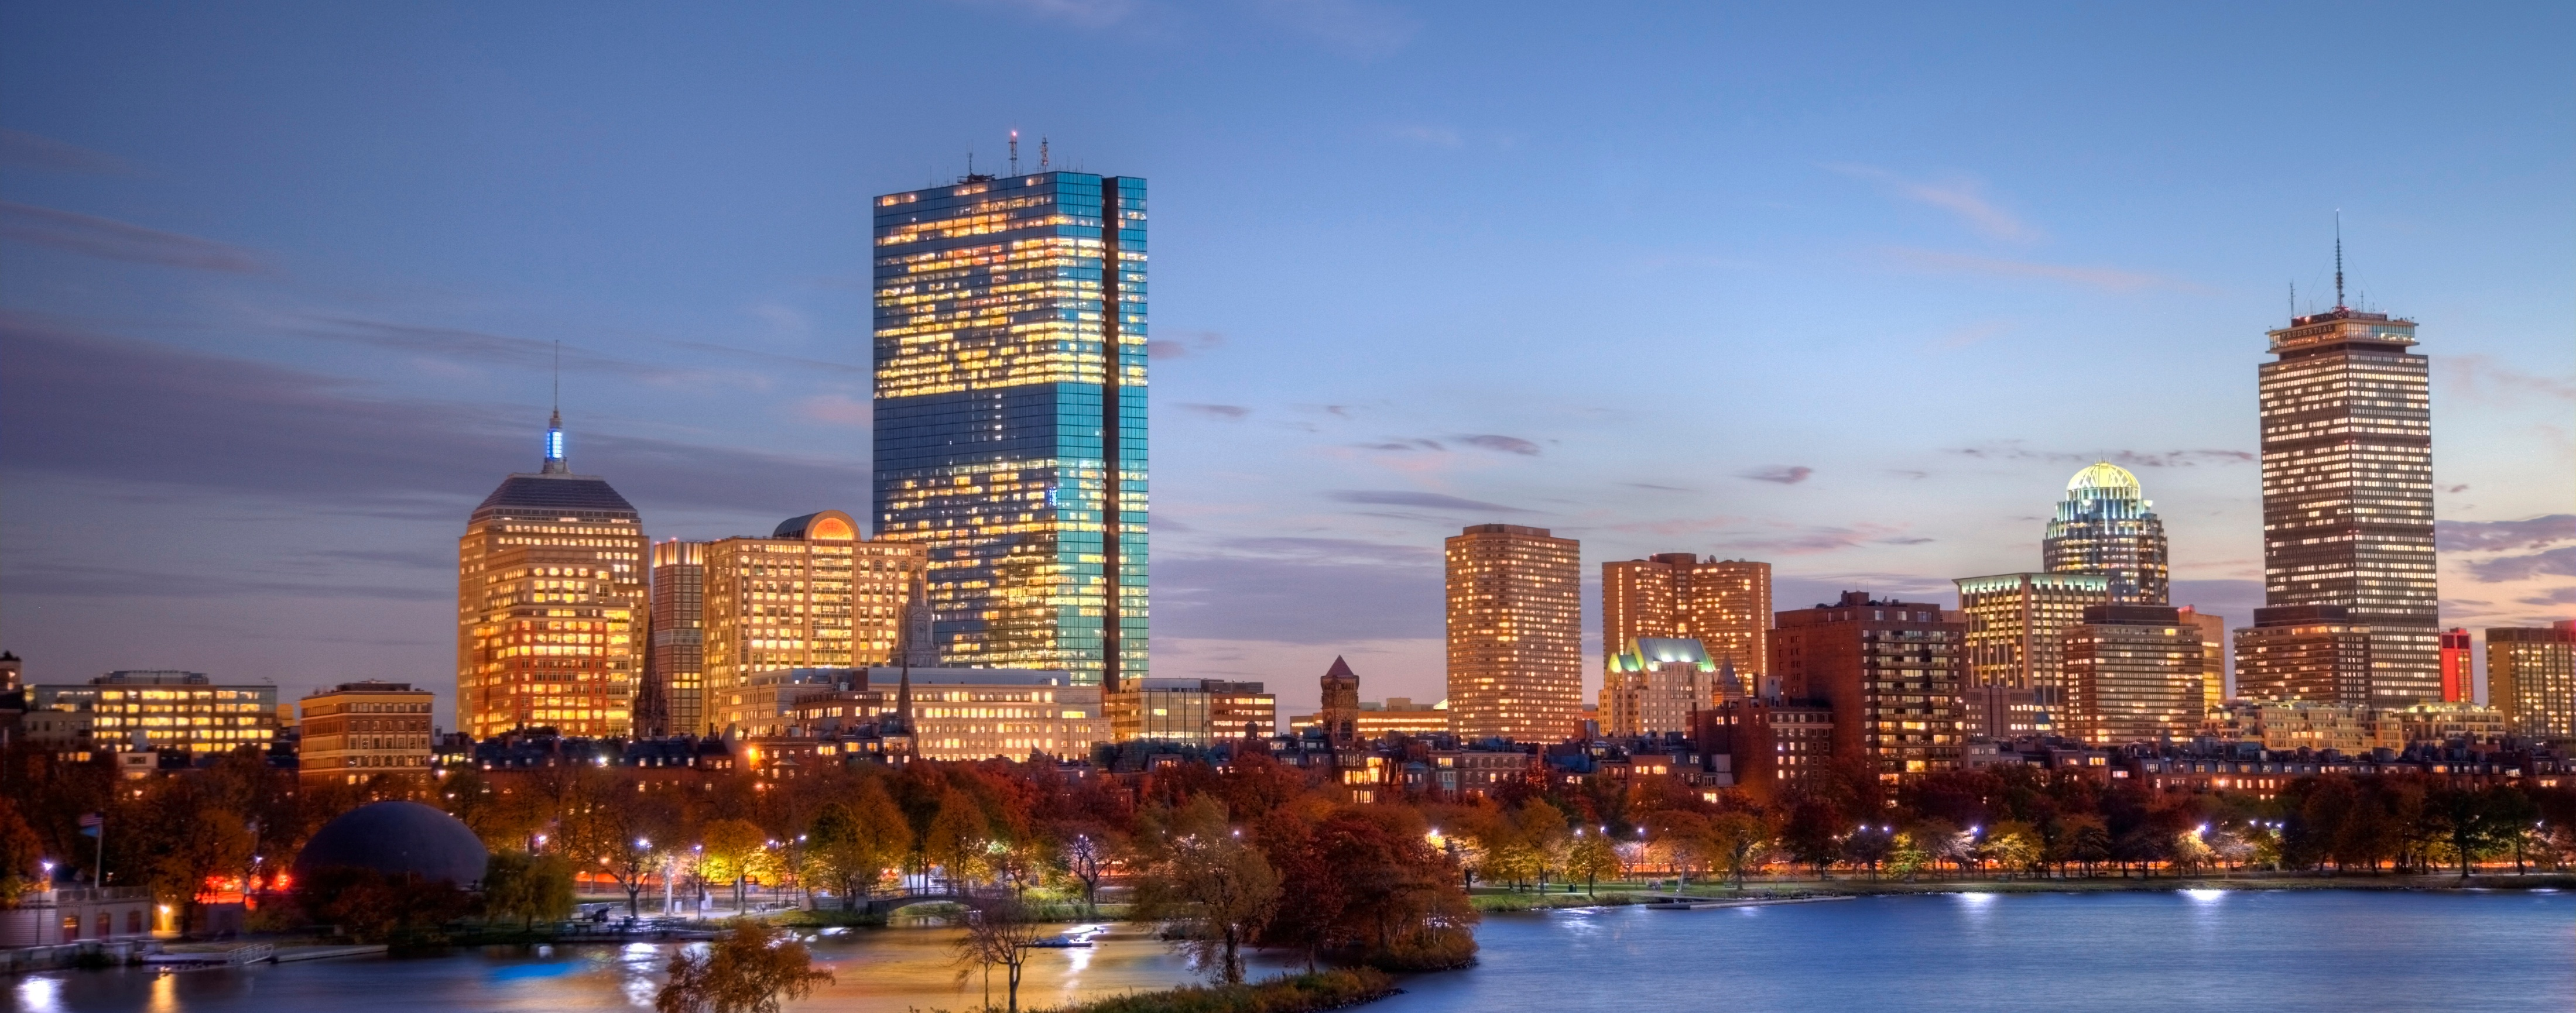 boston (cropped)-1.jpg